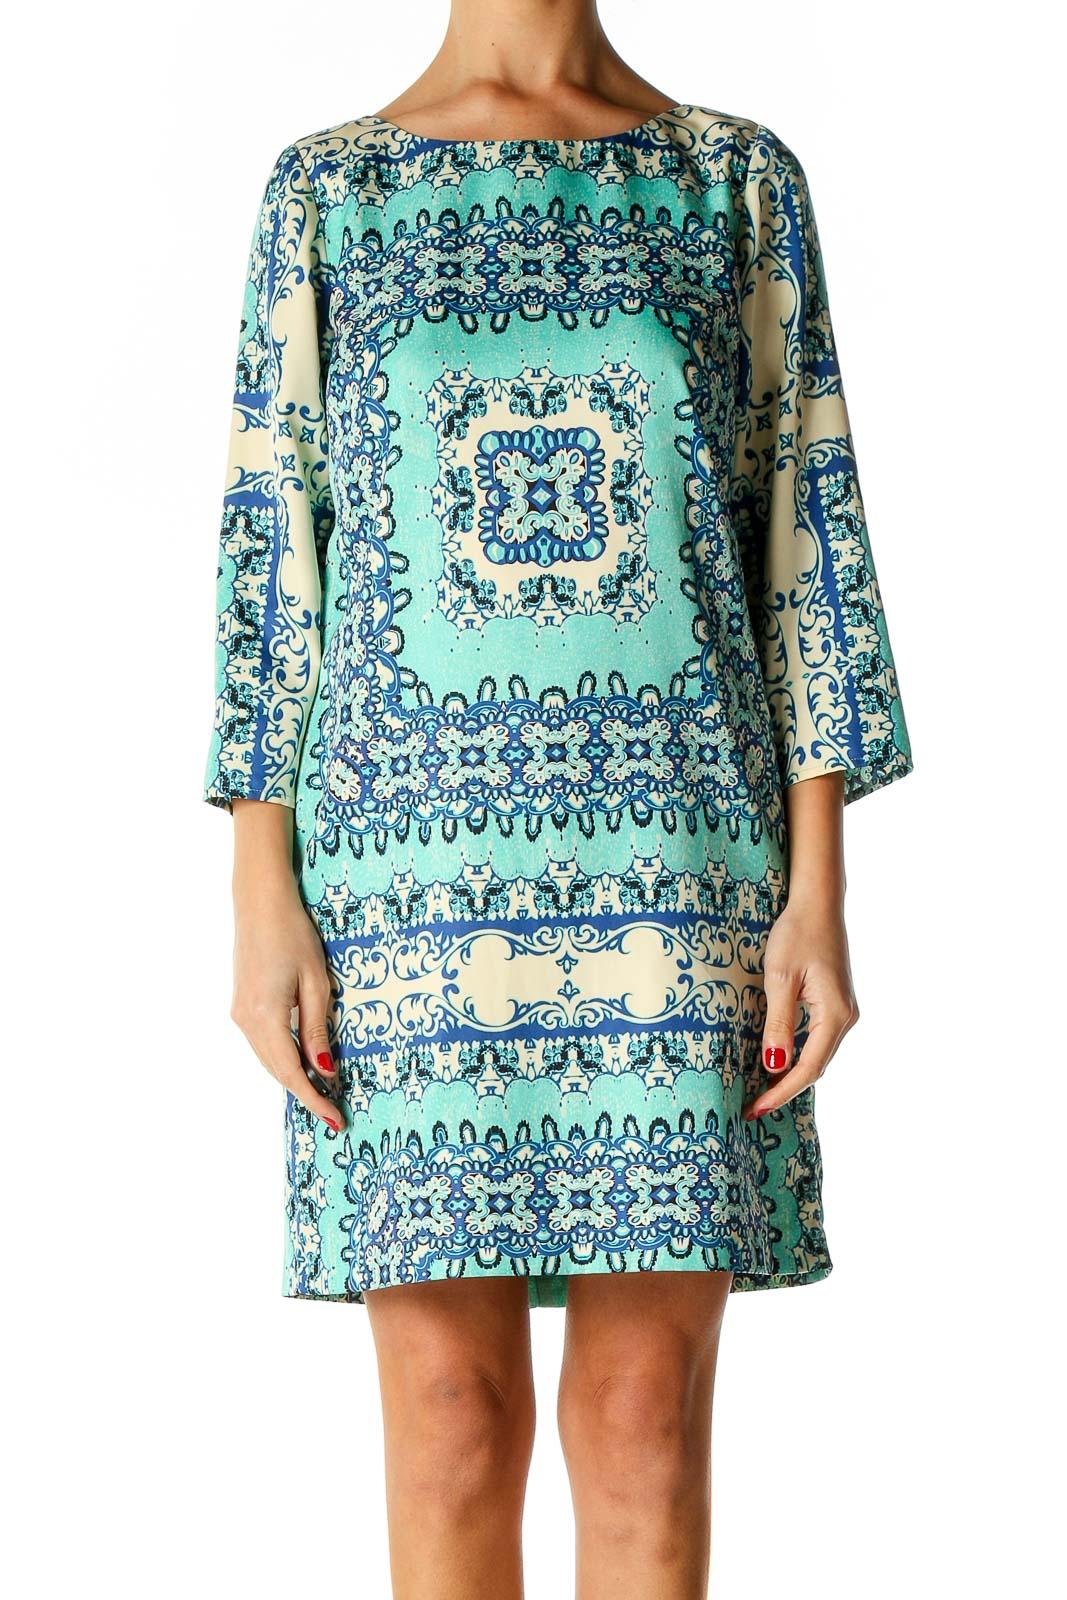 Yellow Aztec Print Bohemian Shift Dress Front